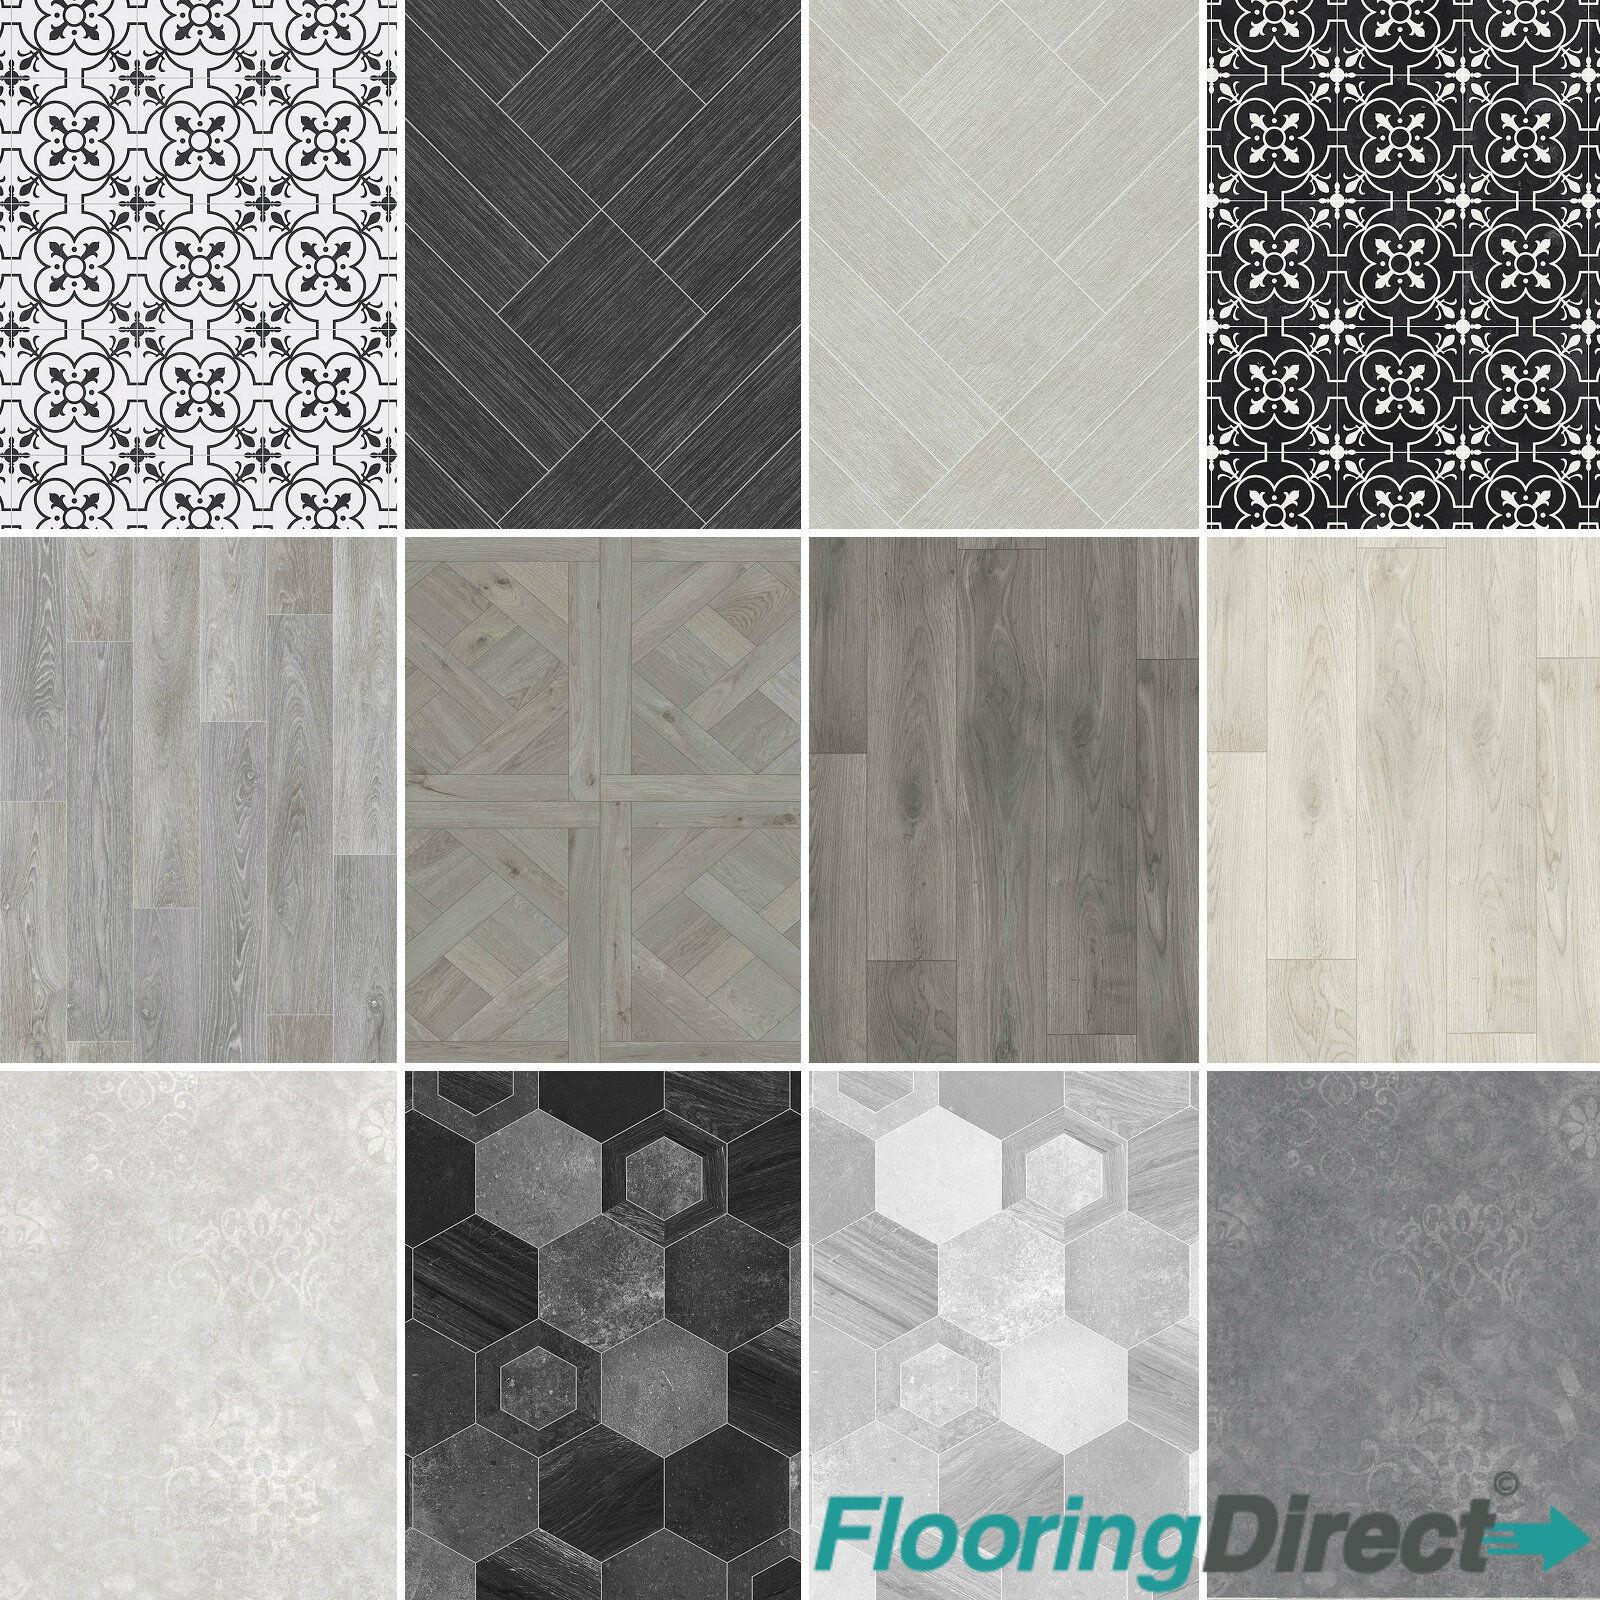 Non Slip Vinyl Flooring Modern Grey Wood Tile Designs Kitchen Bathroom 2 3 4m Ebay